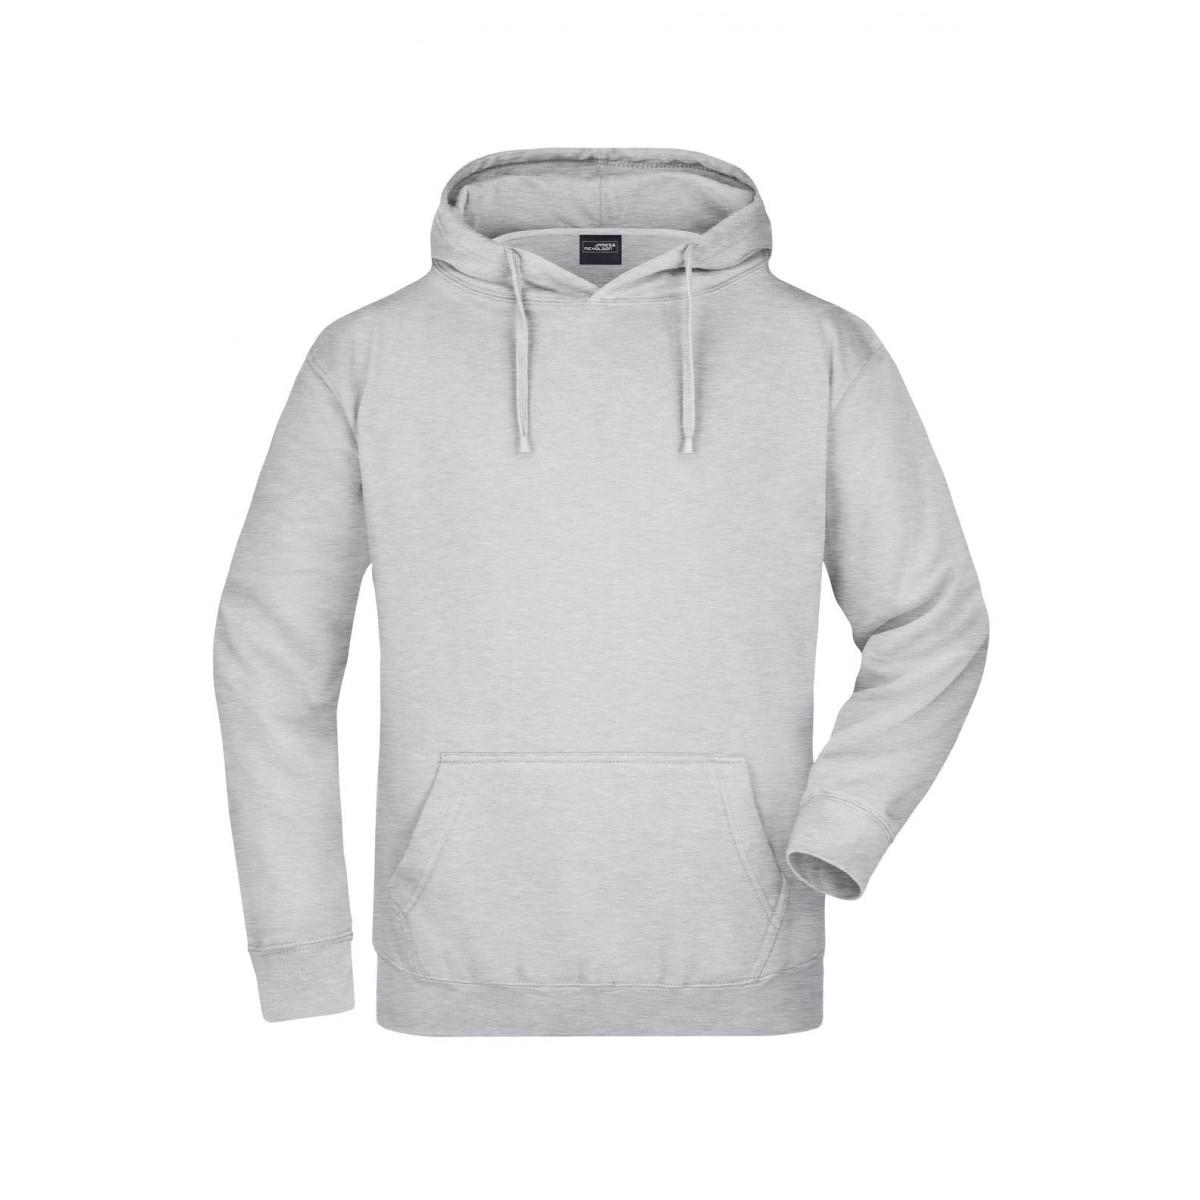 Толстовка мужская JN047 Hooded Sweat - Серый меланж